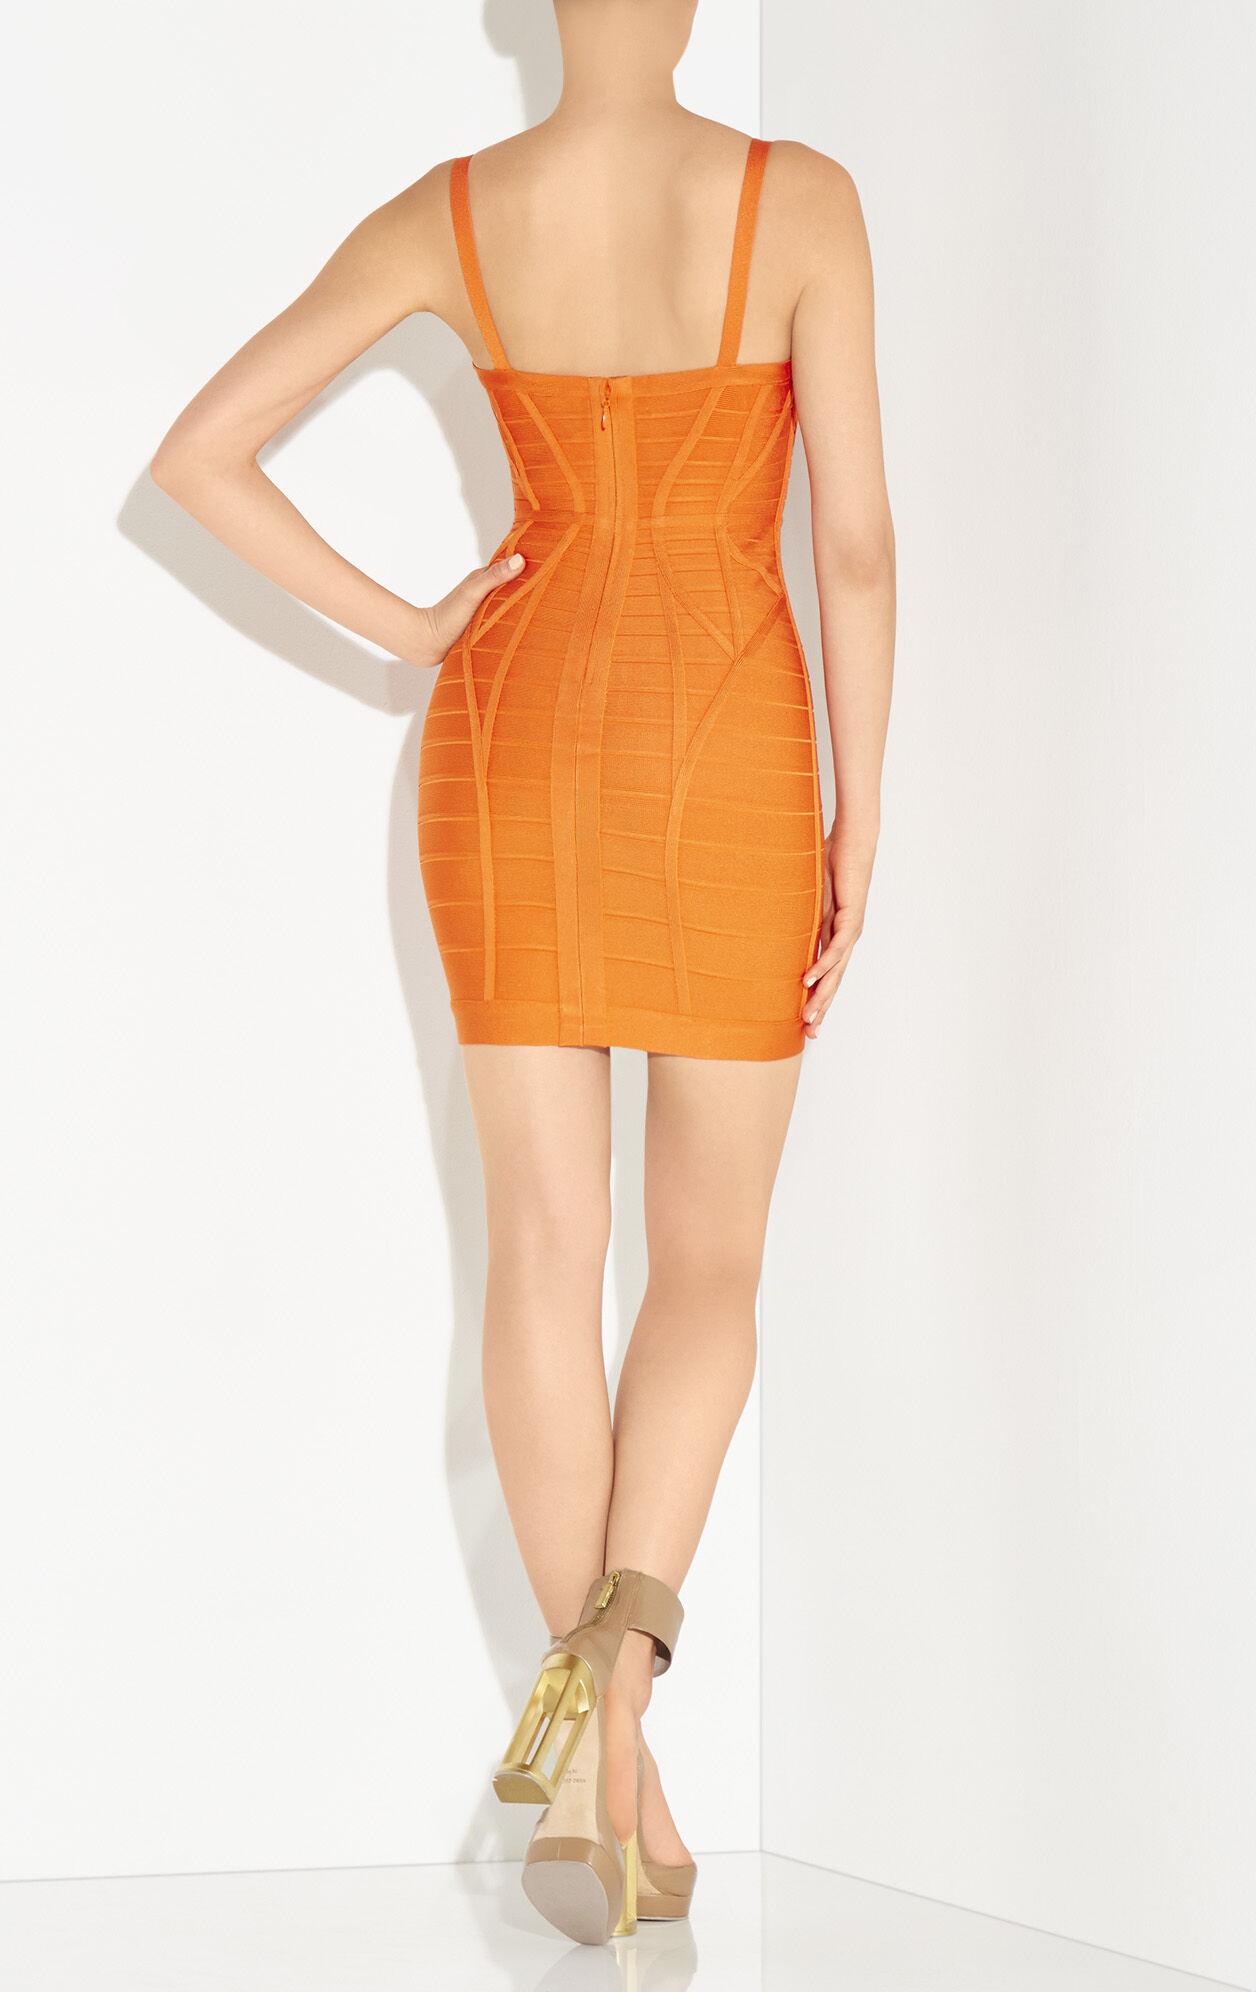 Kollete Novelty Essentials Dress